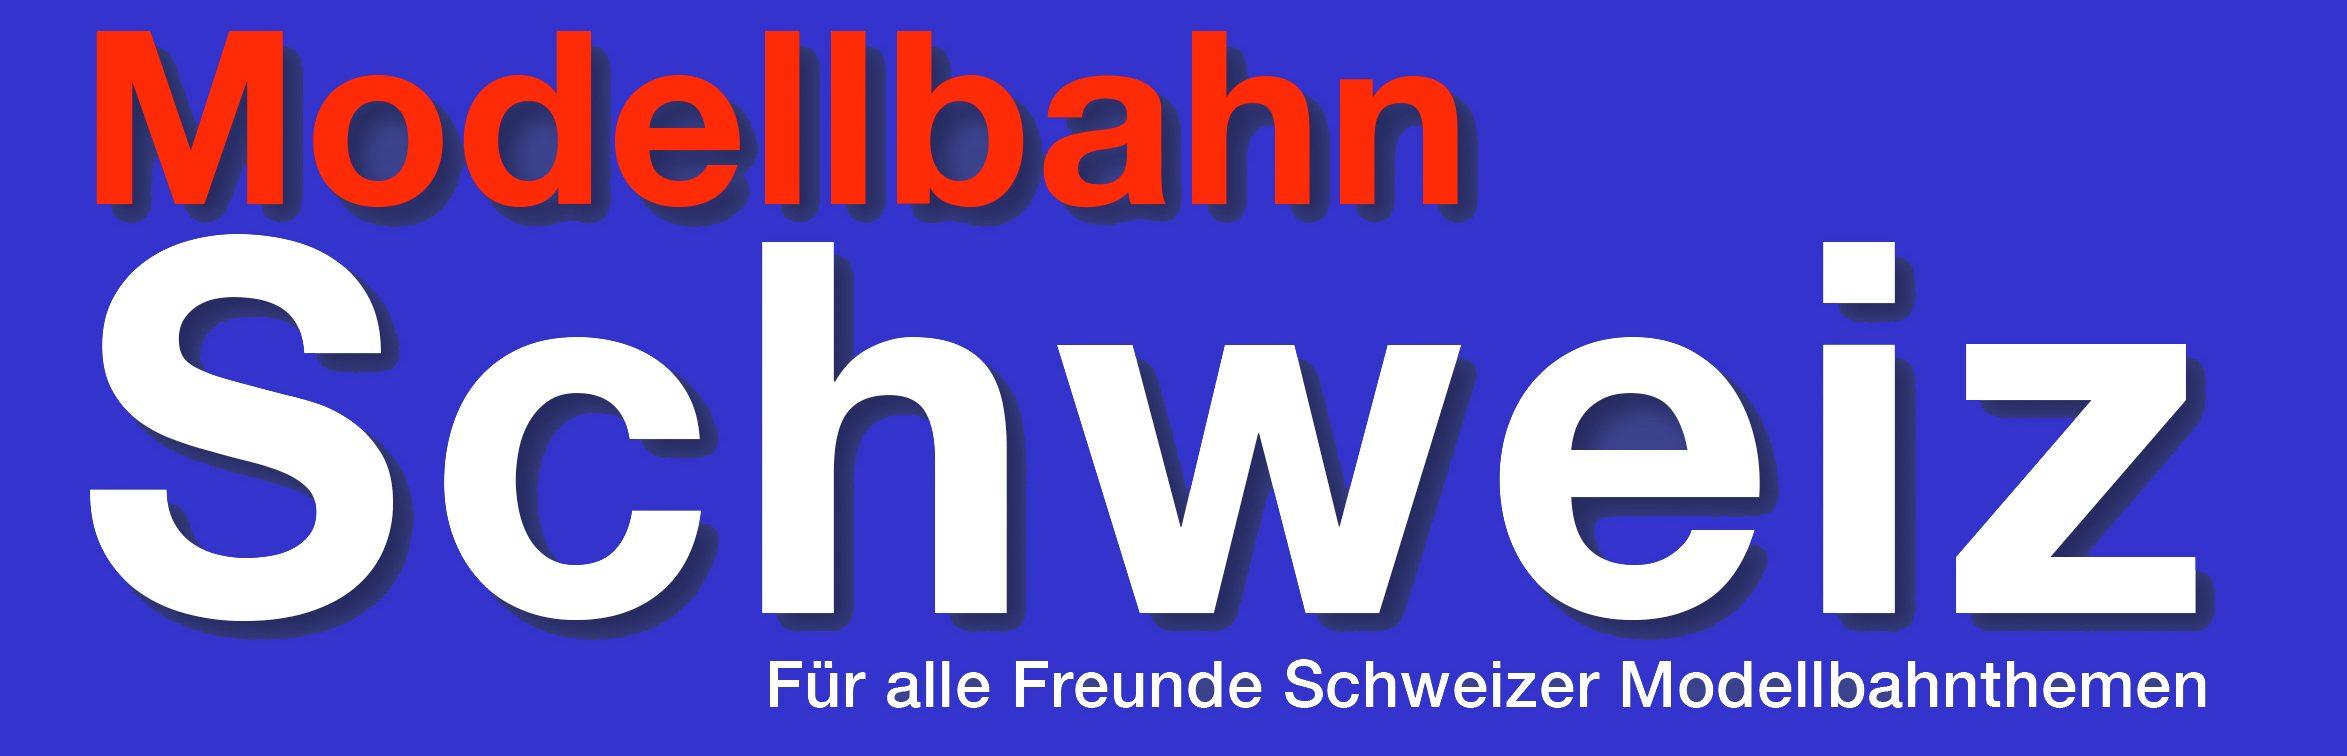 Modellbahn Schweiz